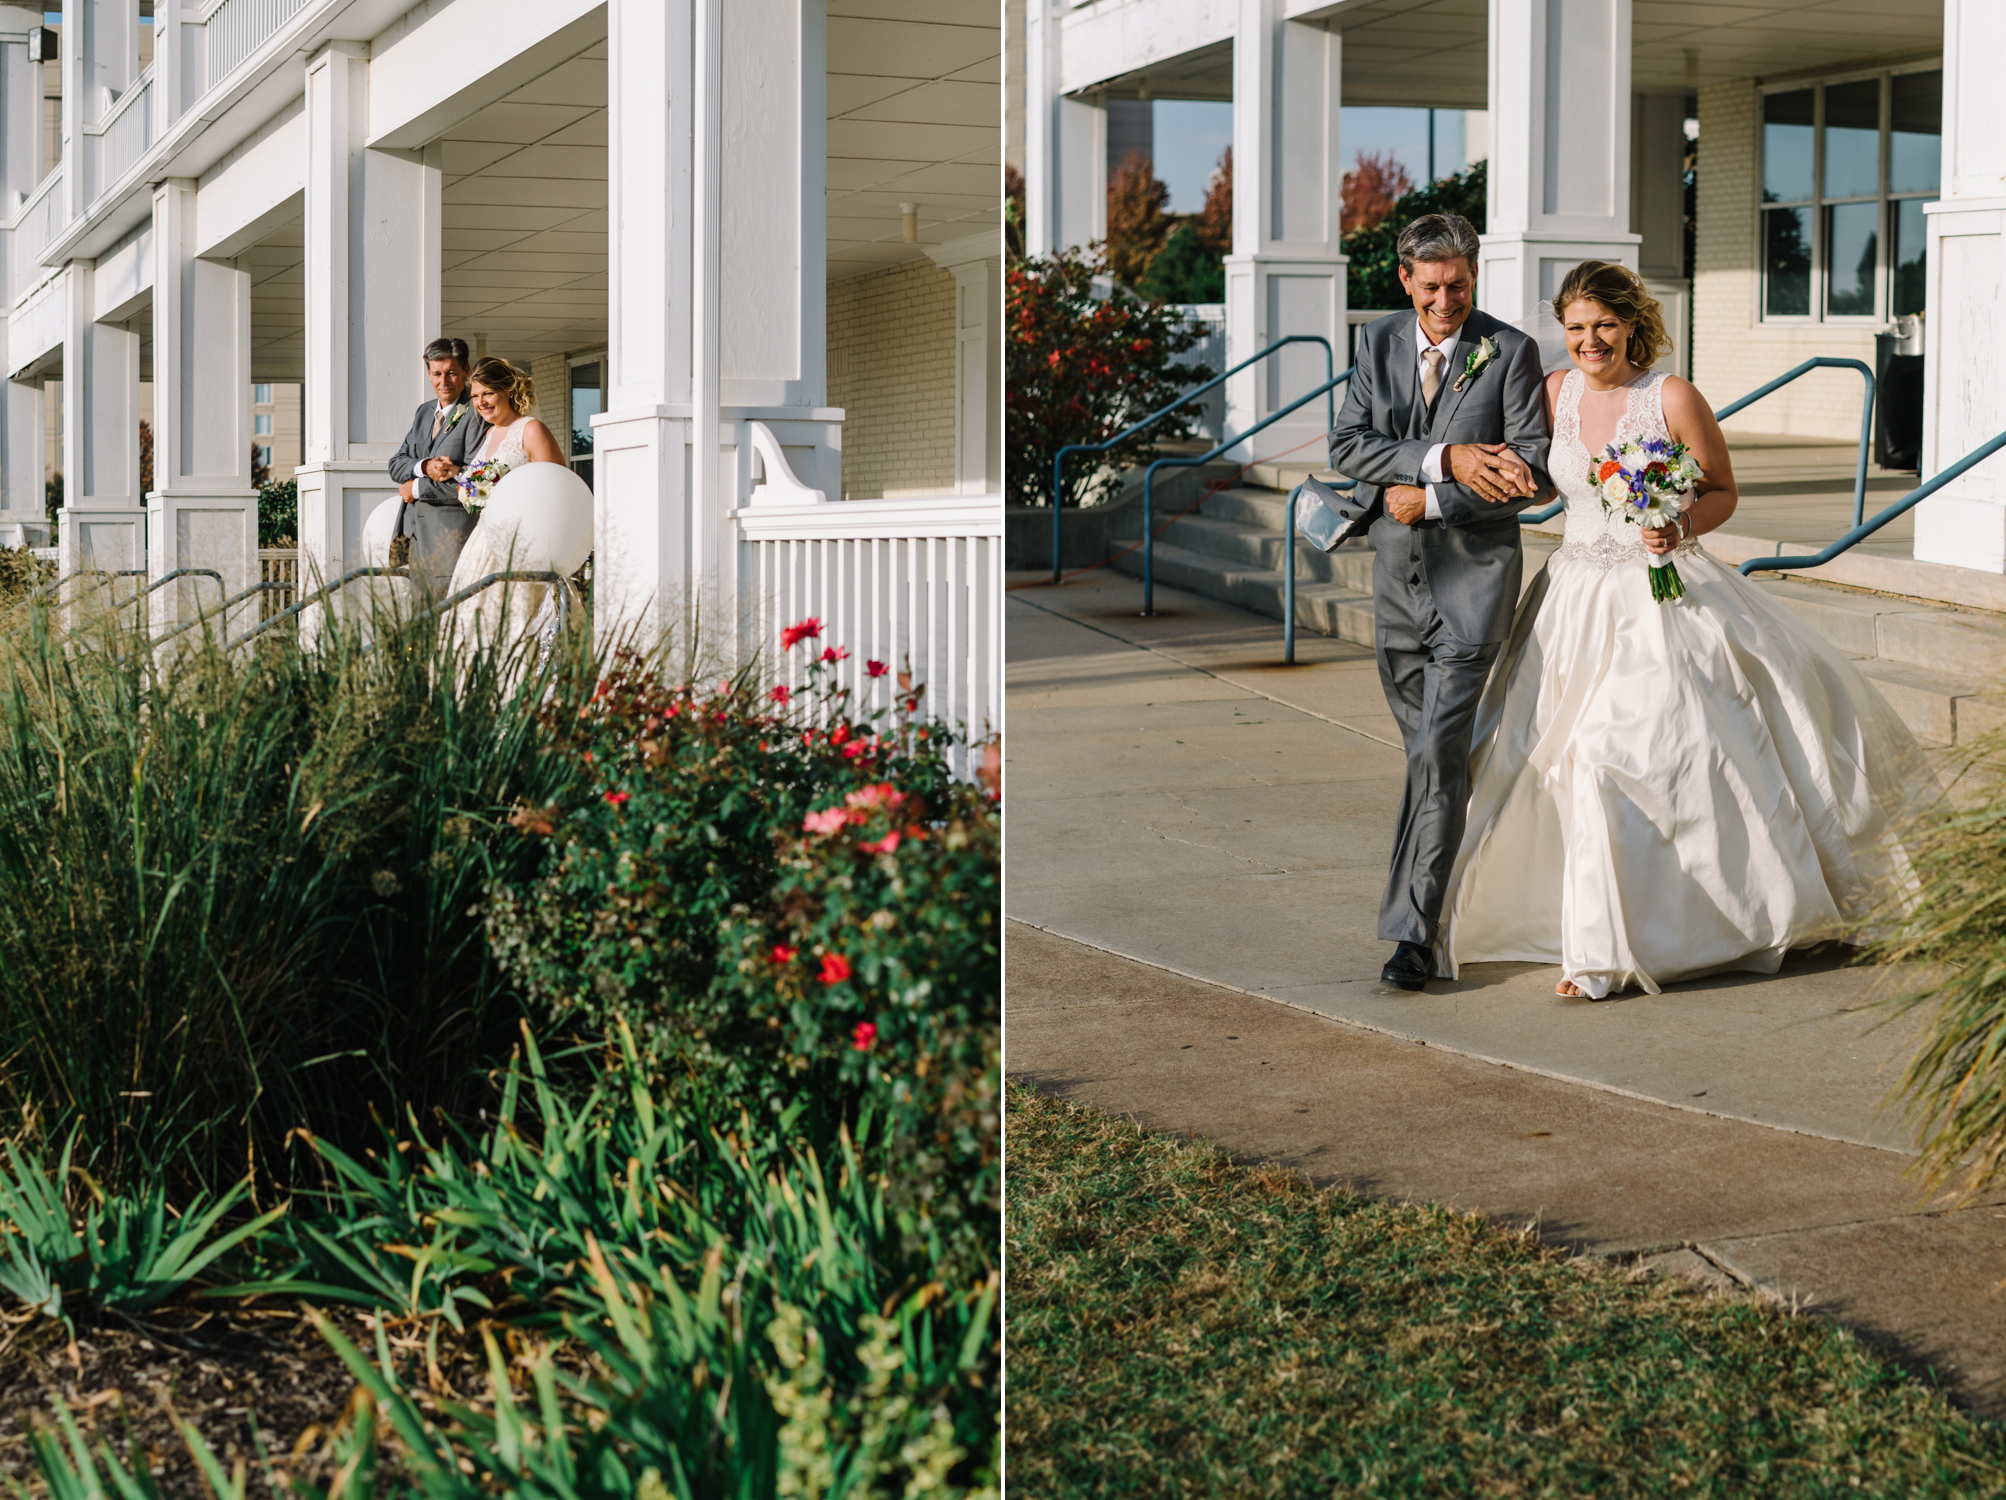 Wichita, Kansas Wedding Photographer-Neal Dieker-Wichita Boathouse Wedding-Wichita, Kansas Outdoor Wedding-176.jpg